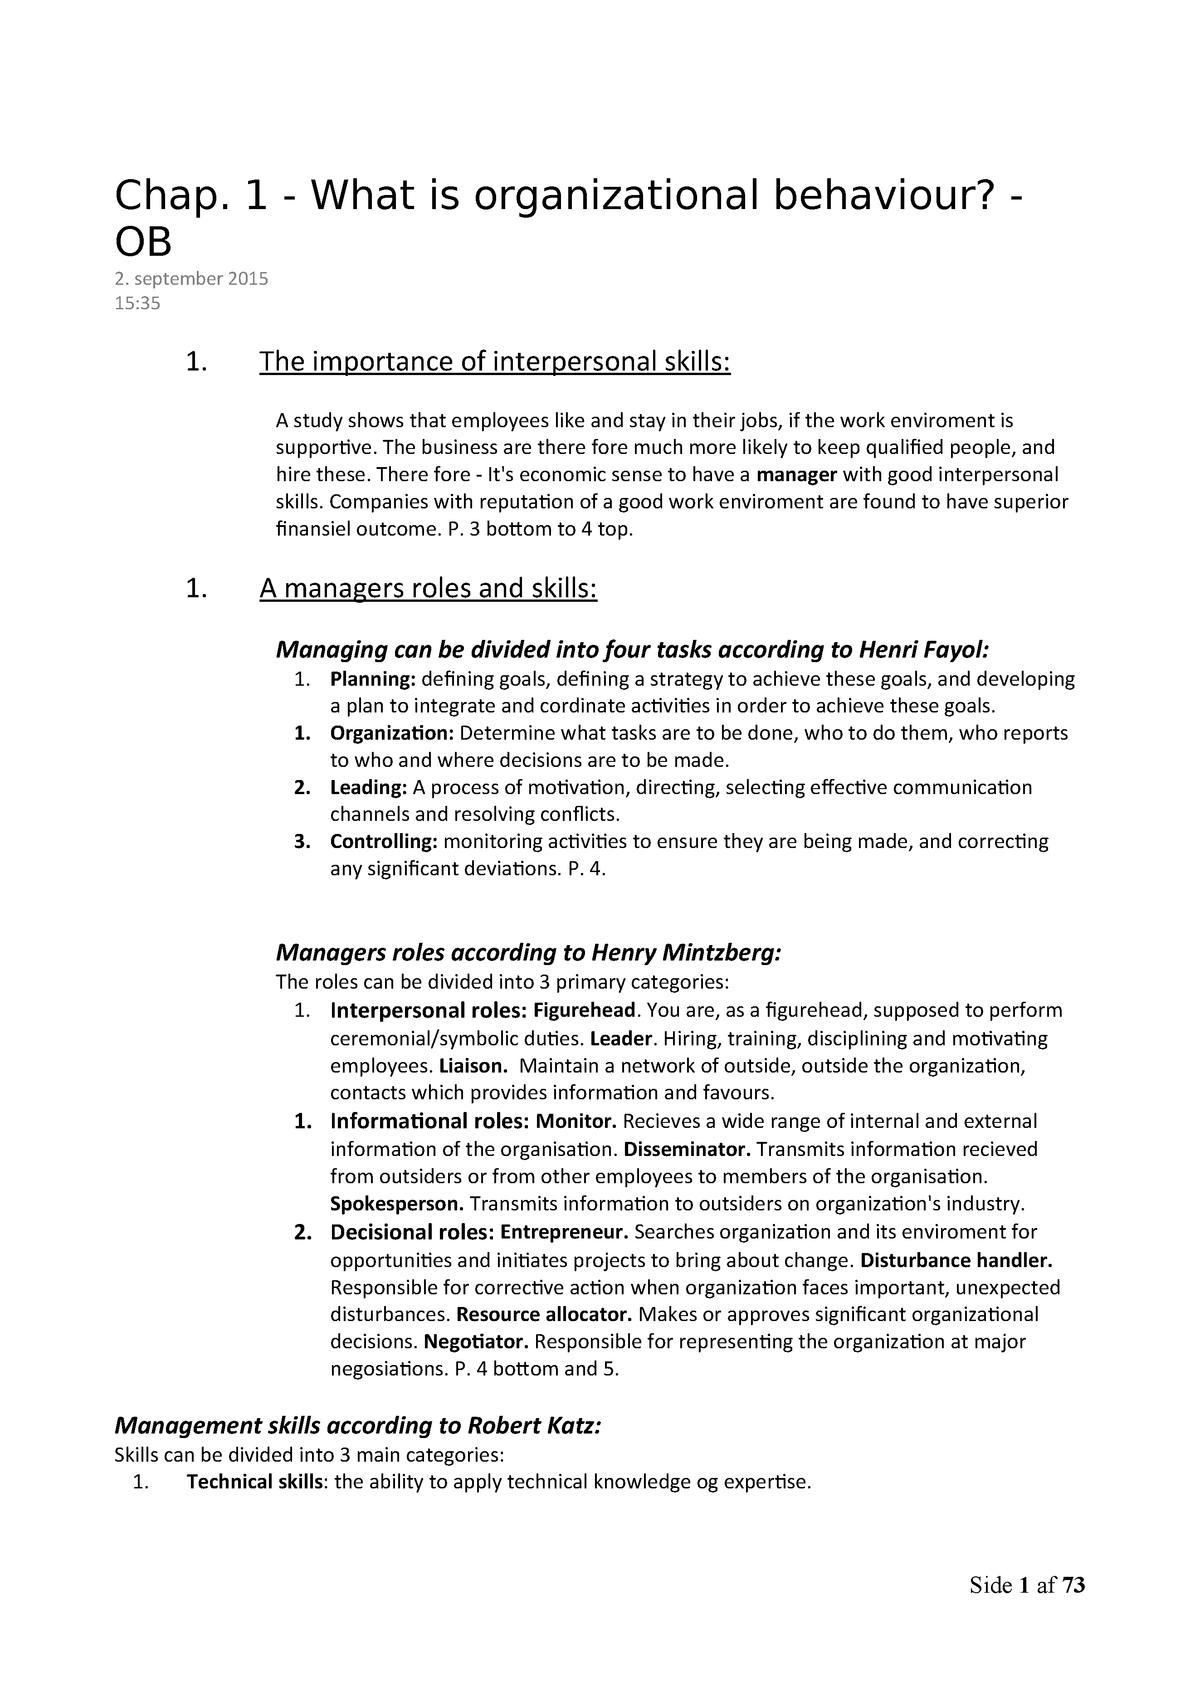 Organizational Behavior - Notes - Organisational Behaviour